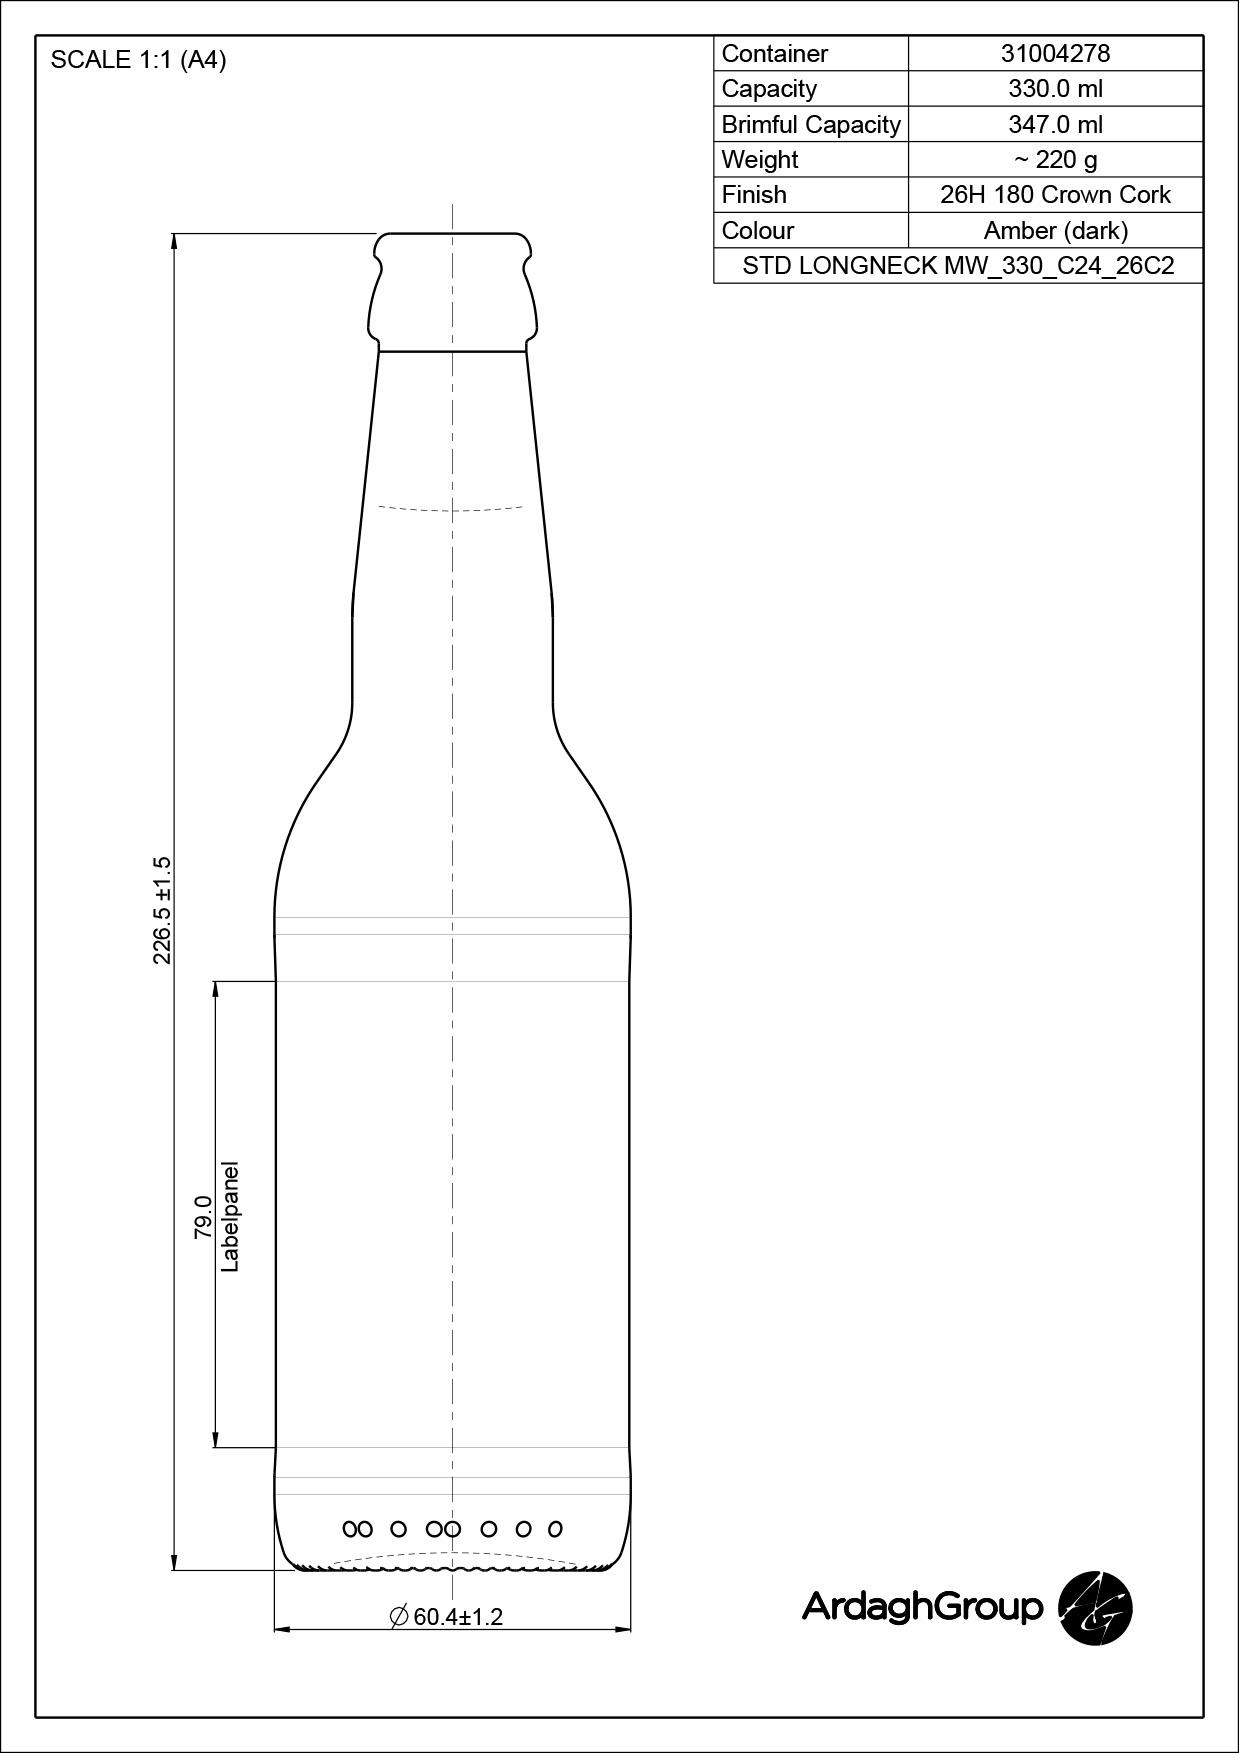 330ml amber glass Longneck oneway beer bottle